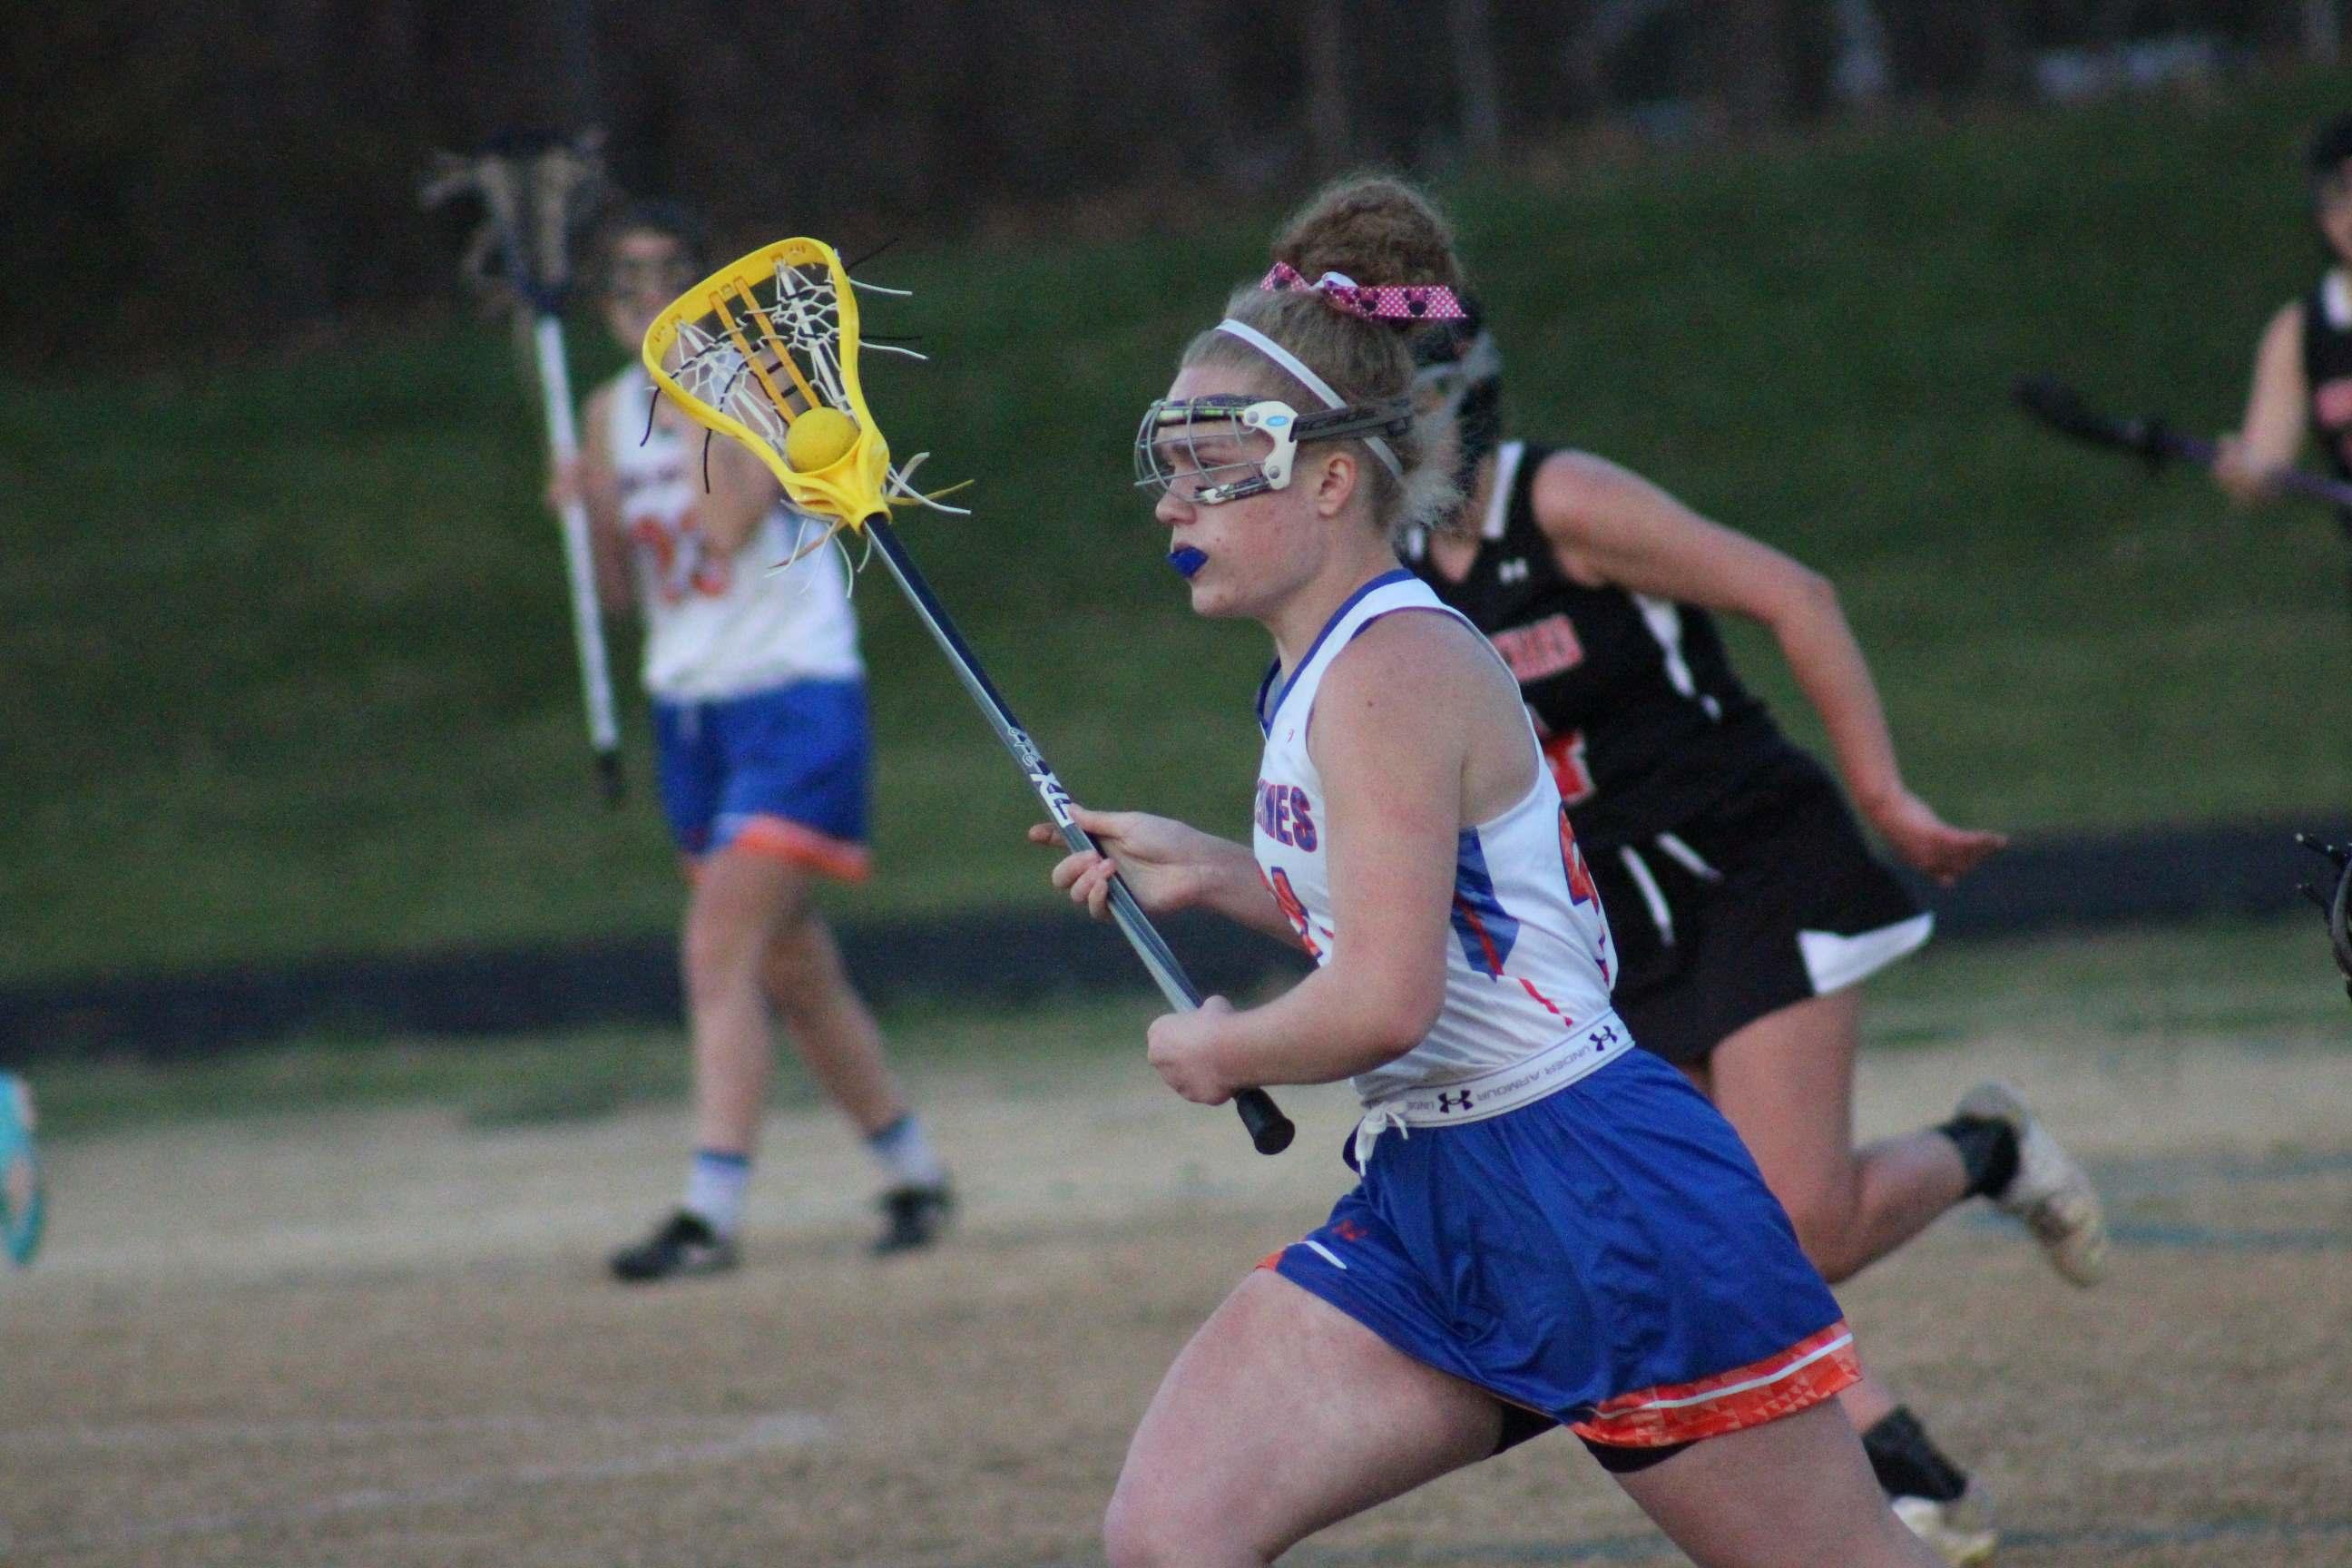 Sophomore Virginia Schlosser runs the ball down the field